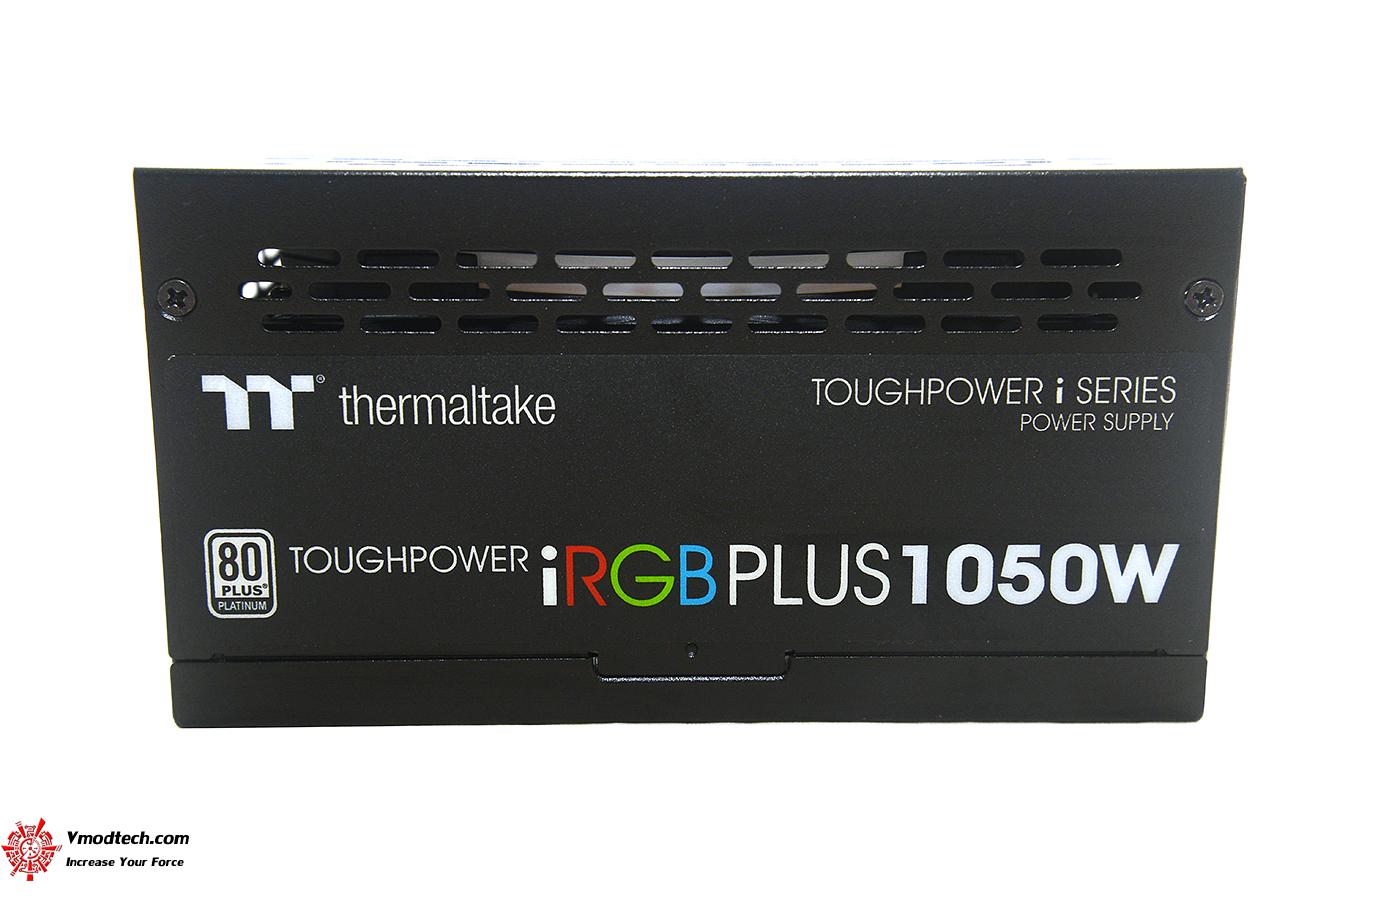 dsc 1468 Thermaltake Toughpower iRGB PLUS 1050W Platinum Review